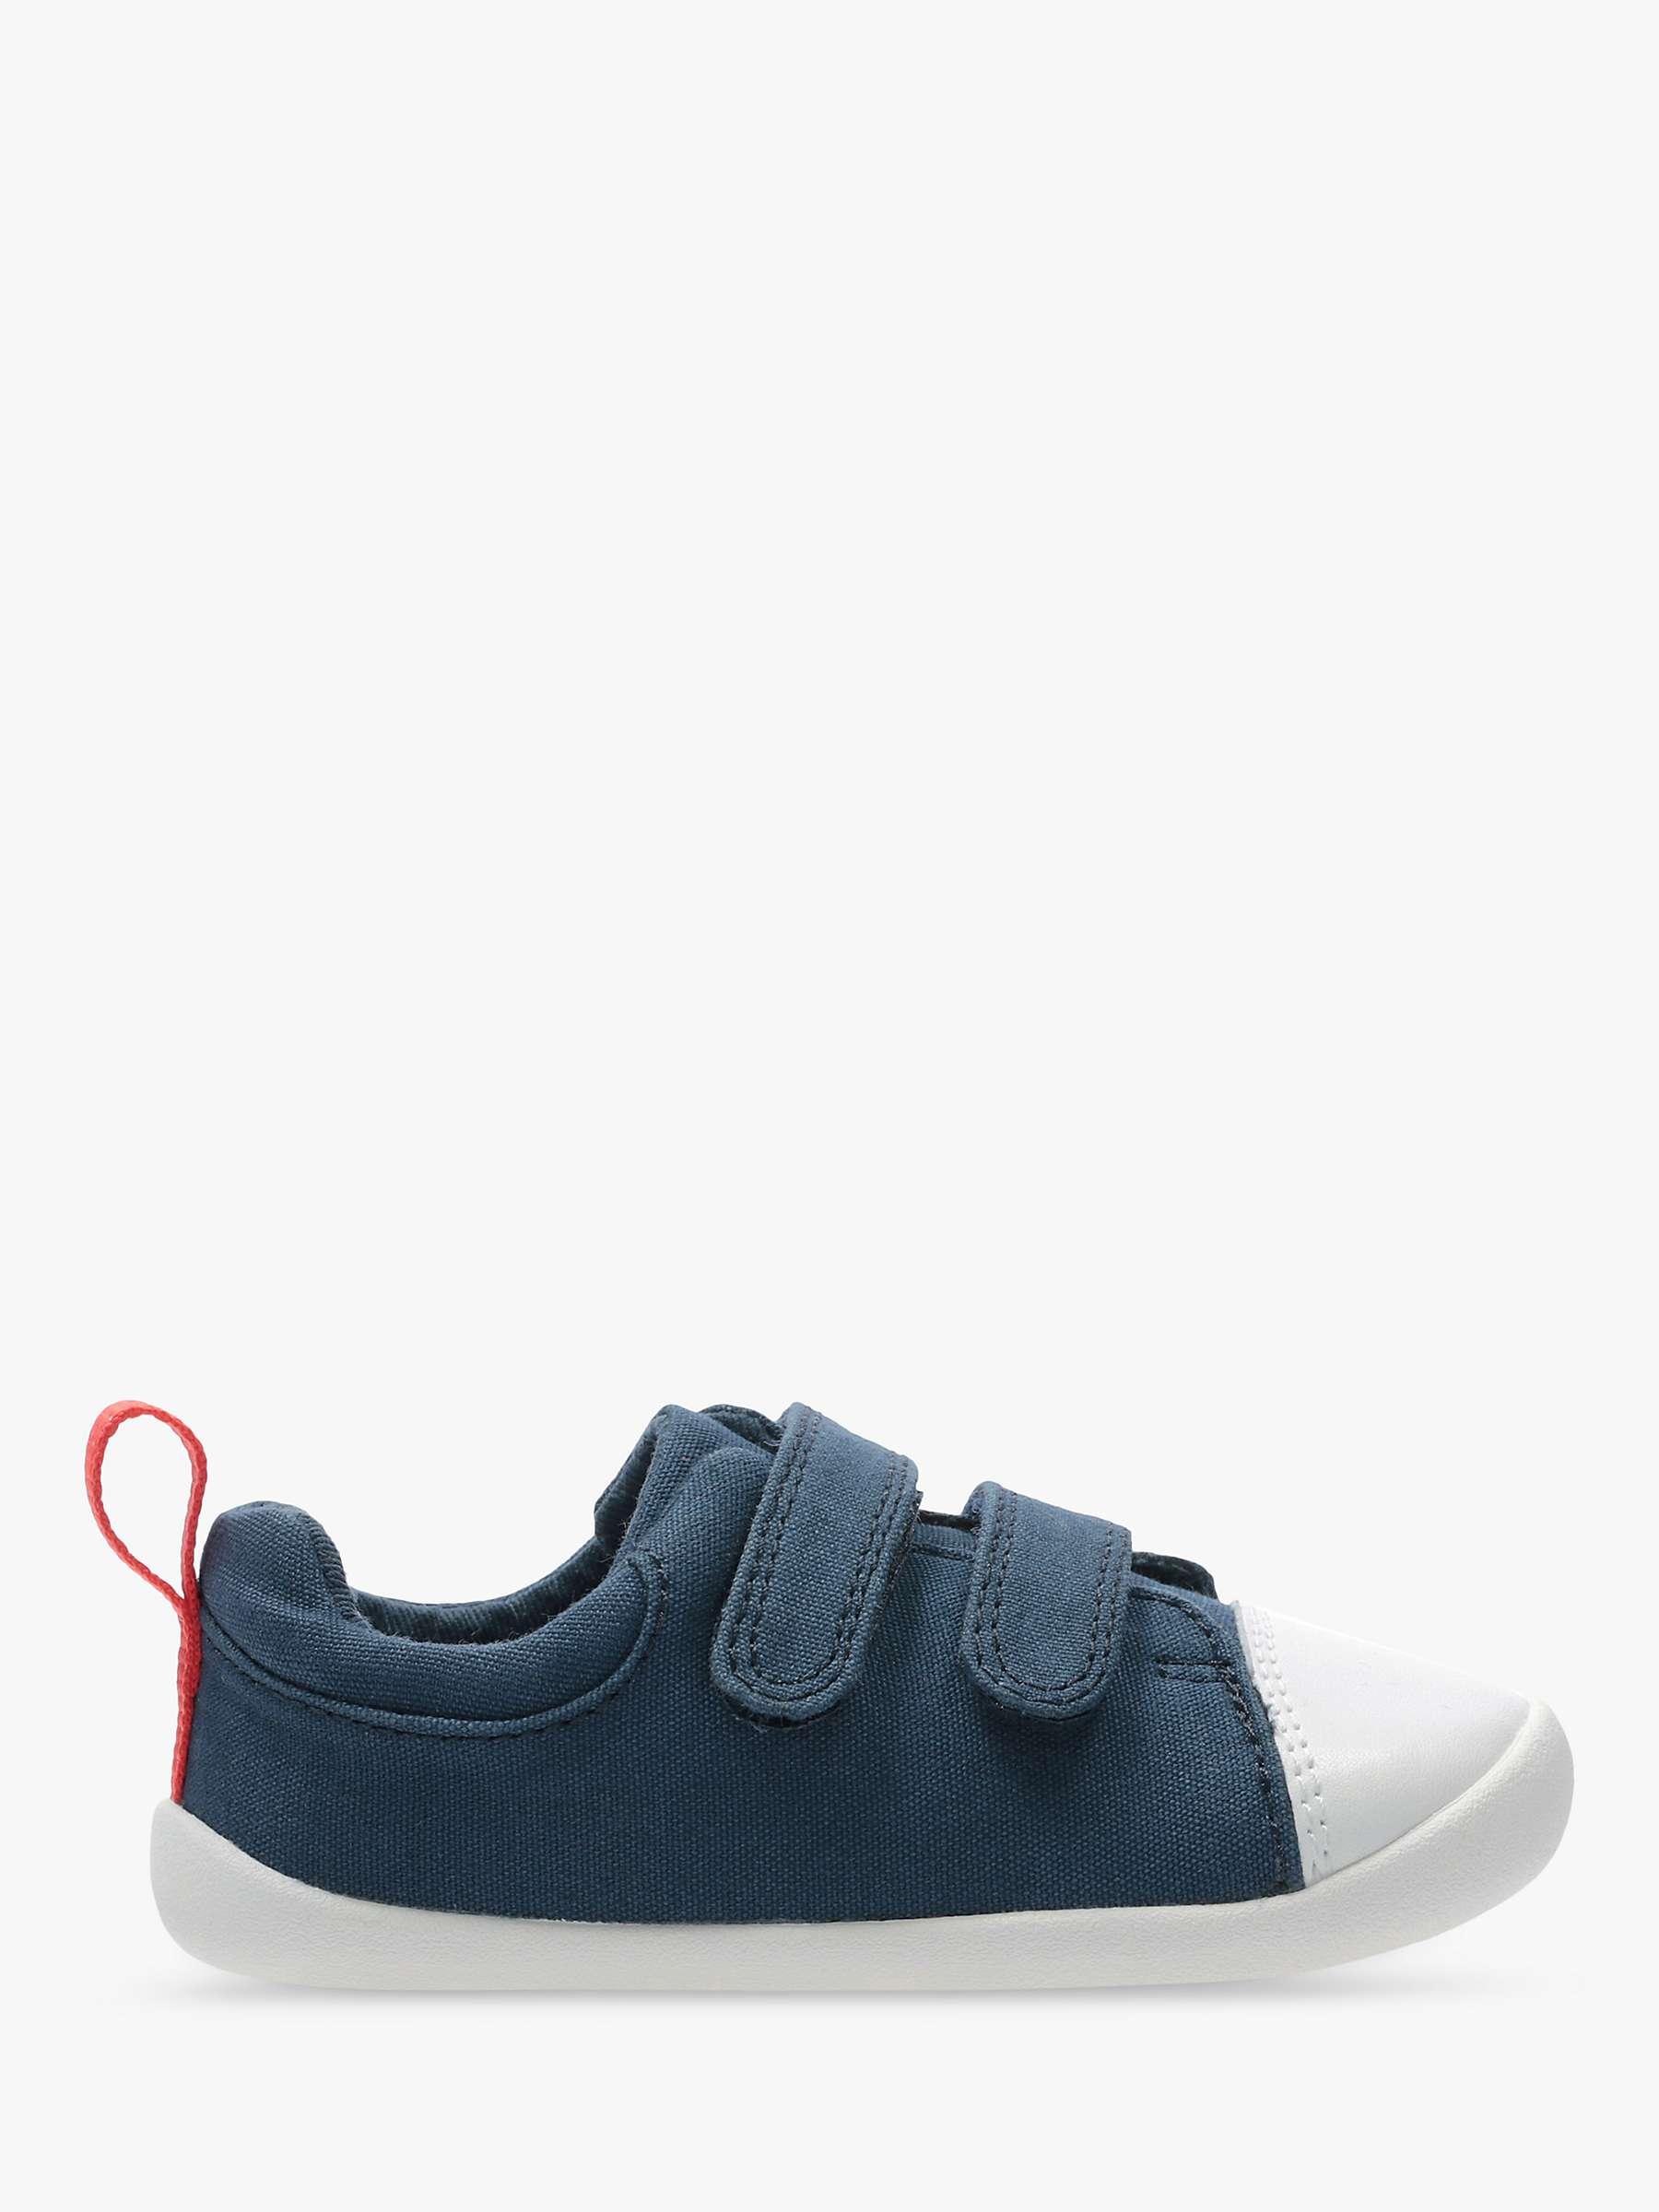 Losver Toddler Boys Canvas Sneakers Star Navy